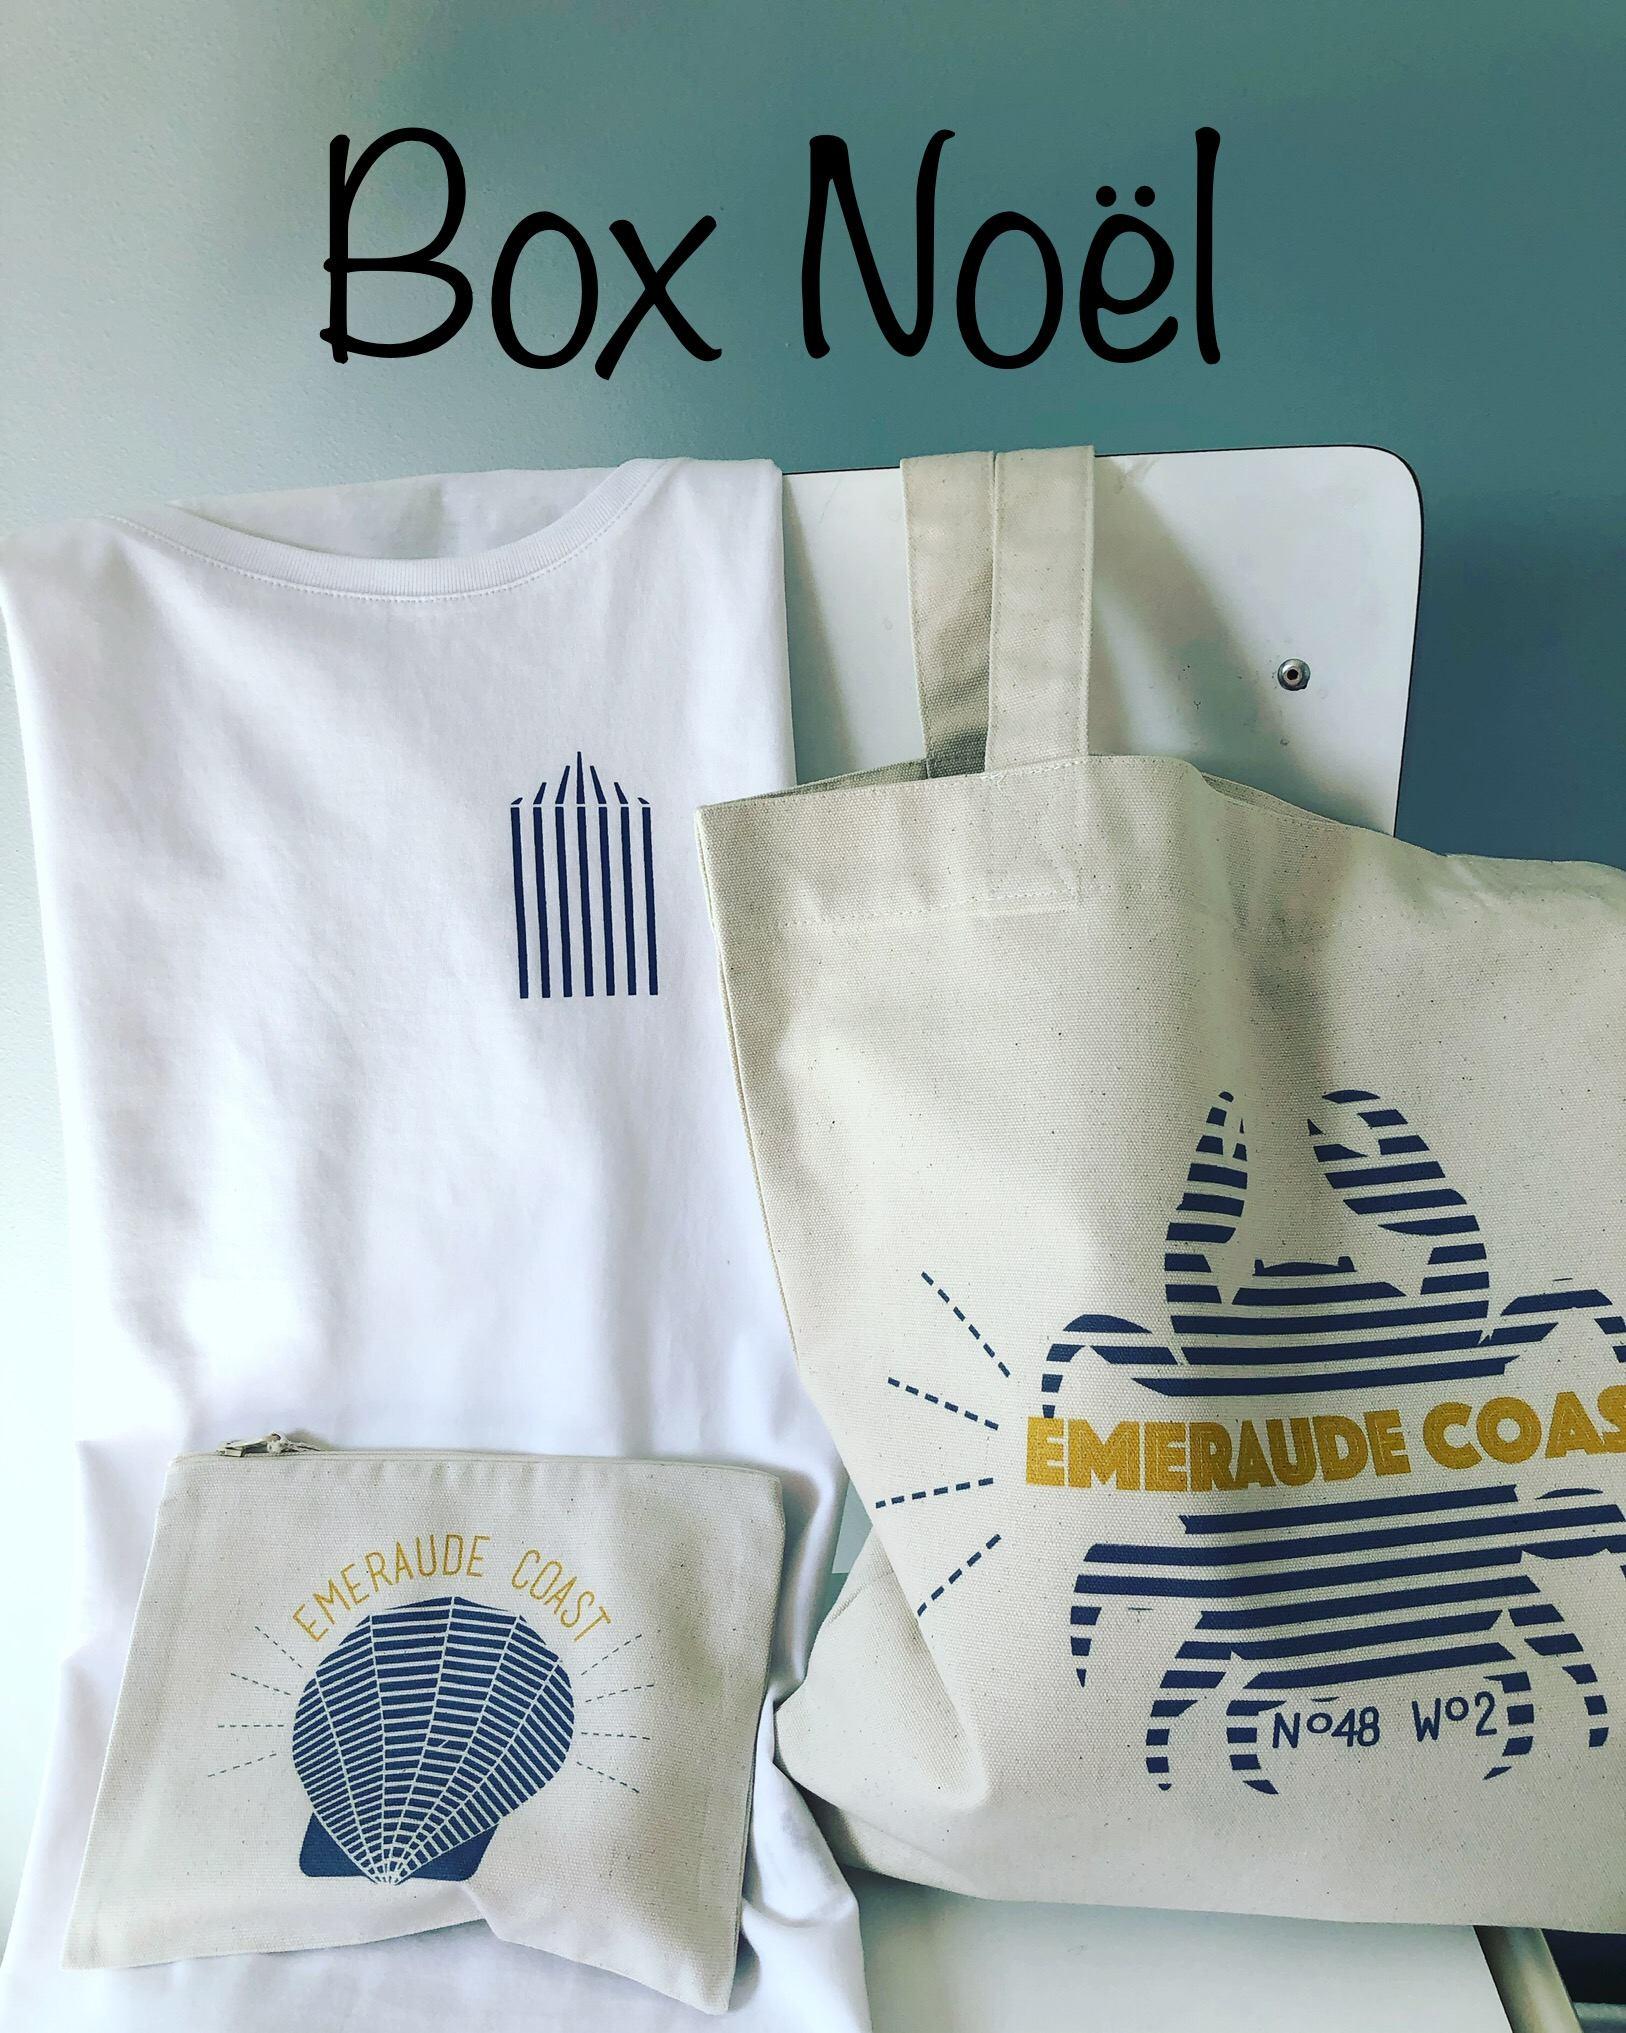 BOX NOEL